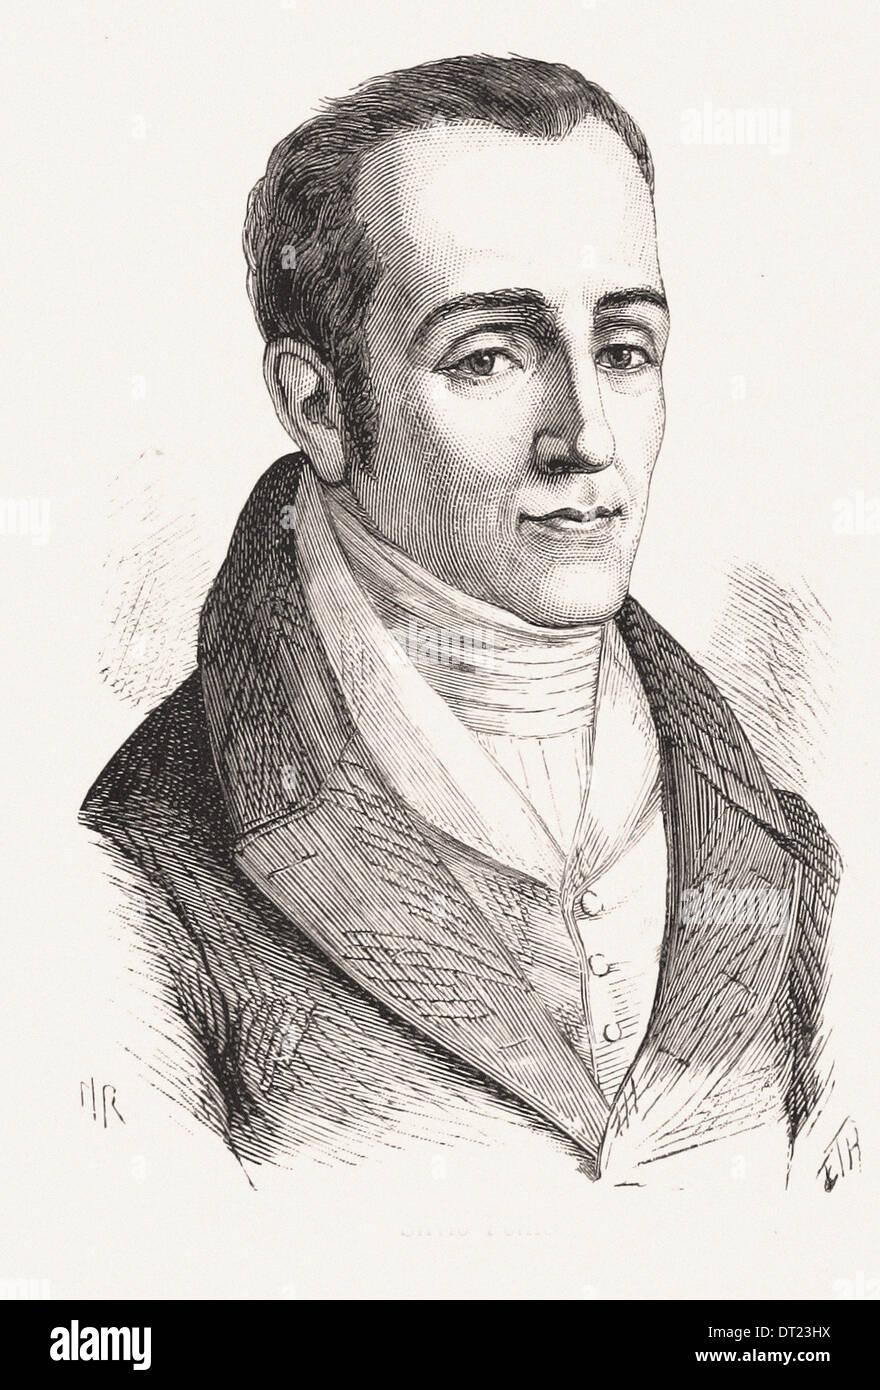 Portrait of Silvio - French engraving XIX th century - Stock Image